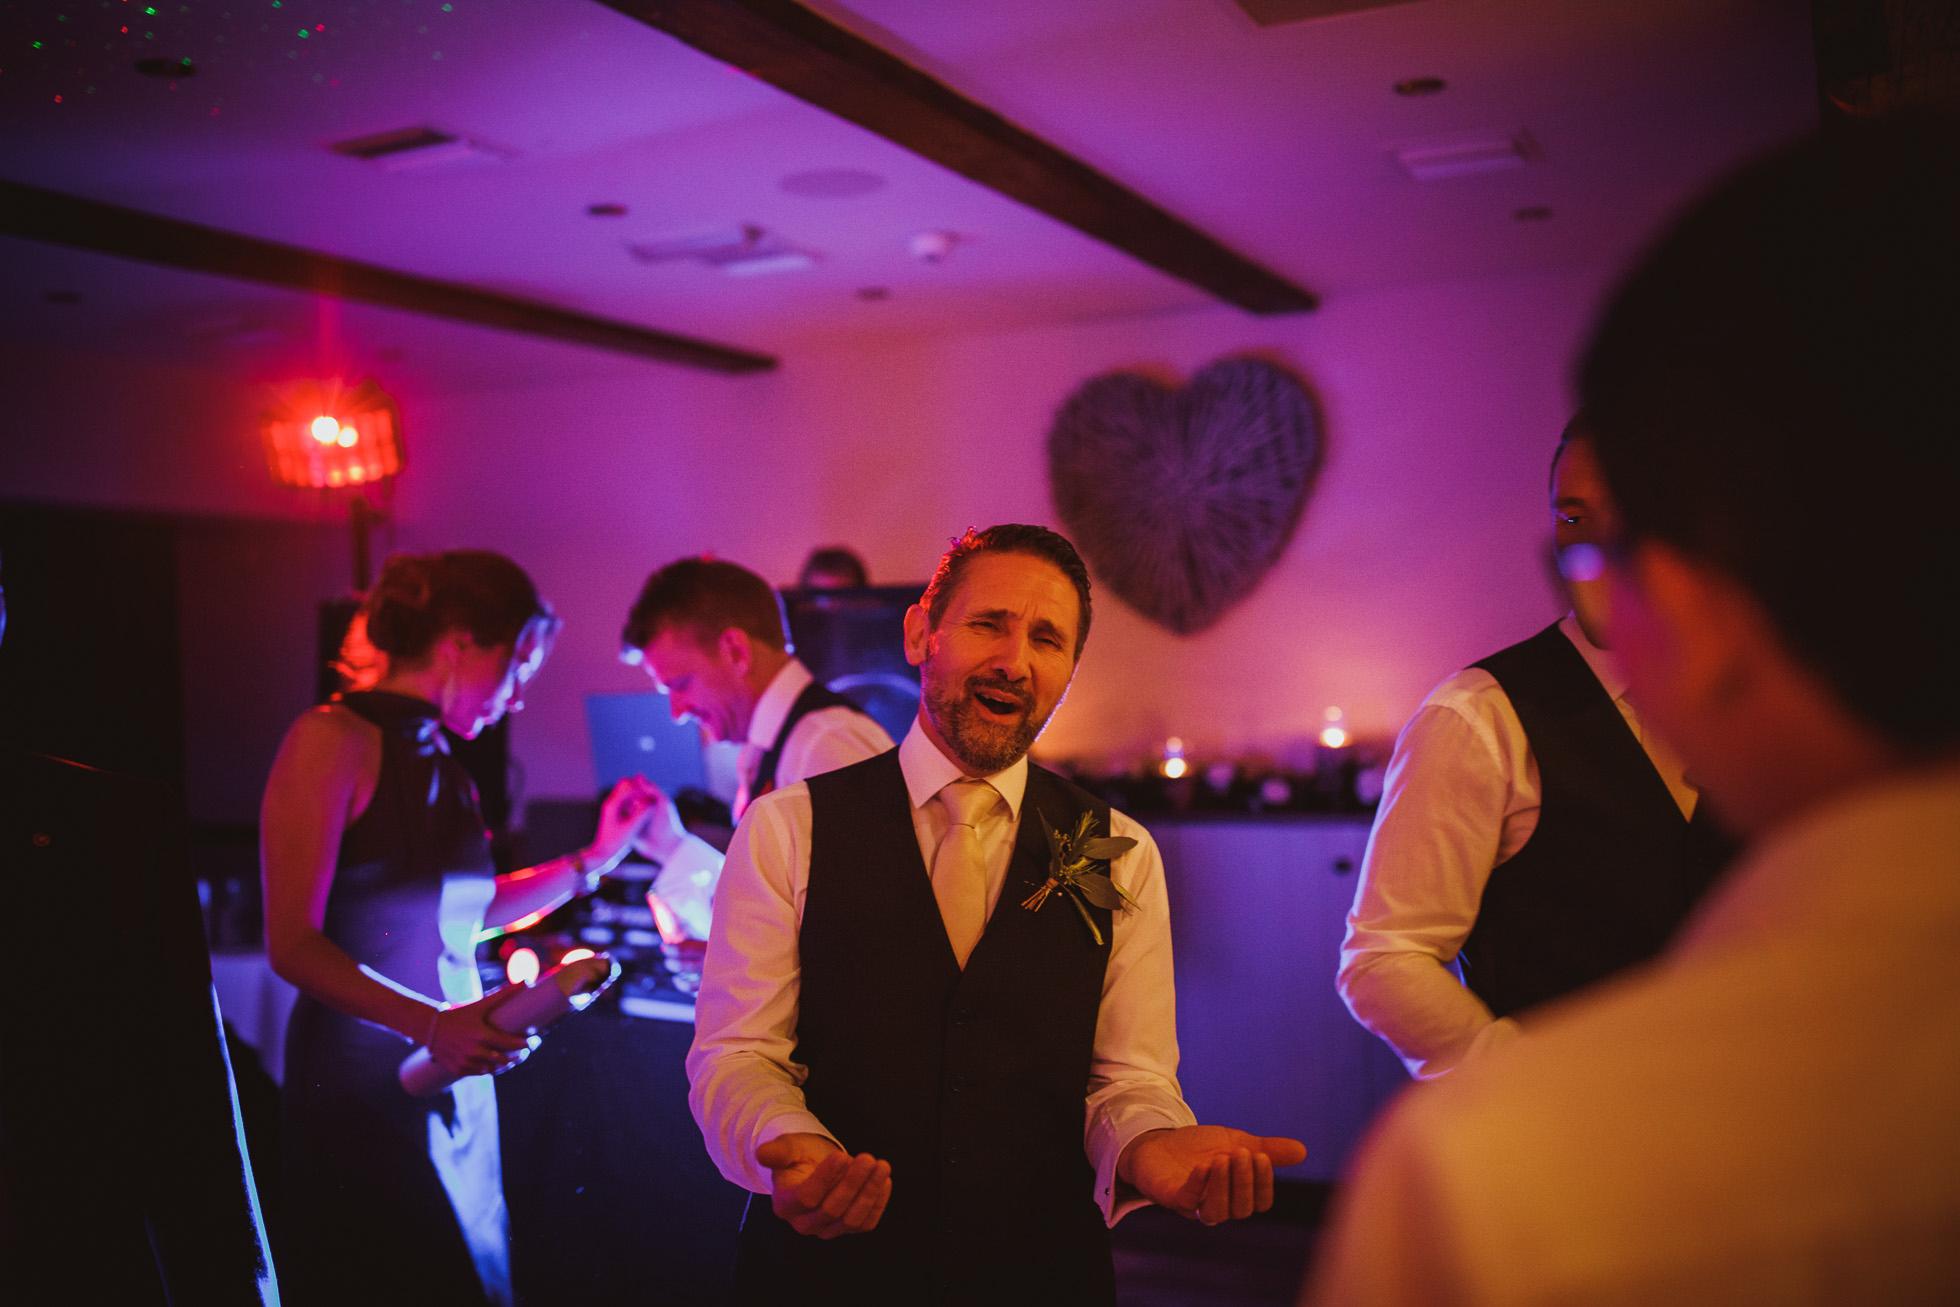 woodman_inn_thunderbridge_wedding_photographer-110.jpg